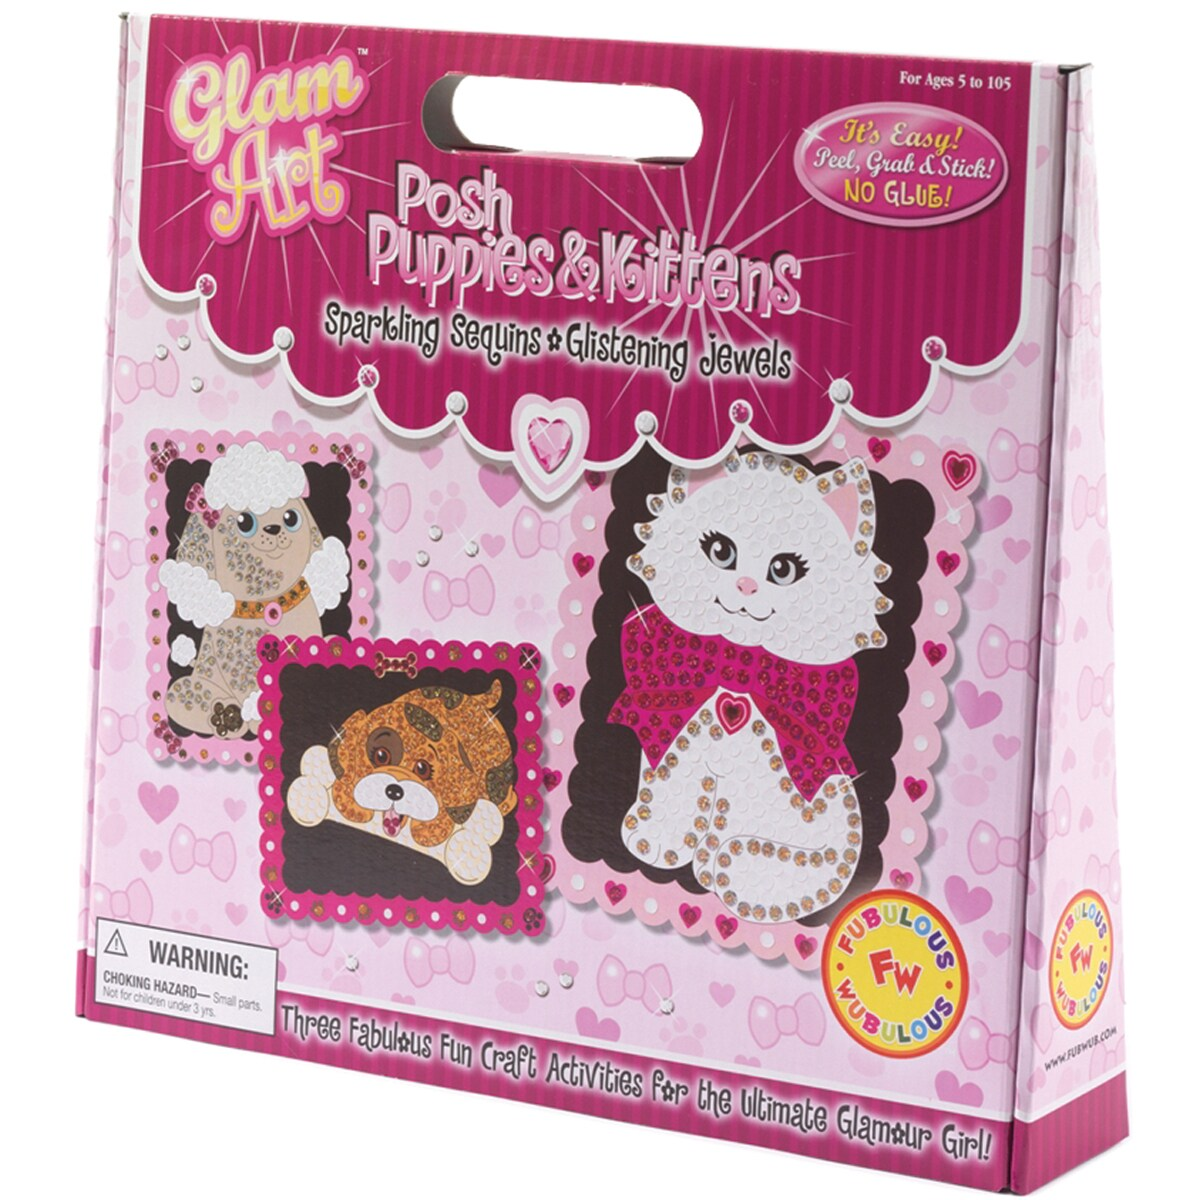 Do-A-Dot Glam Art Kit-Posh Puppies & Kittens